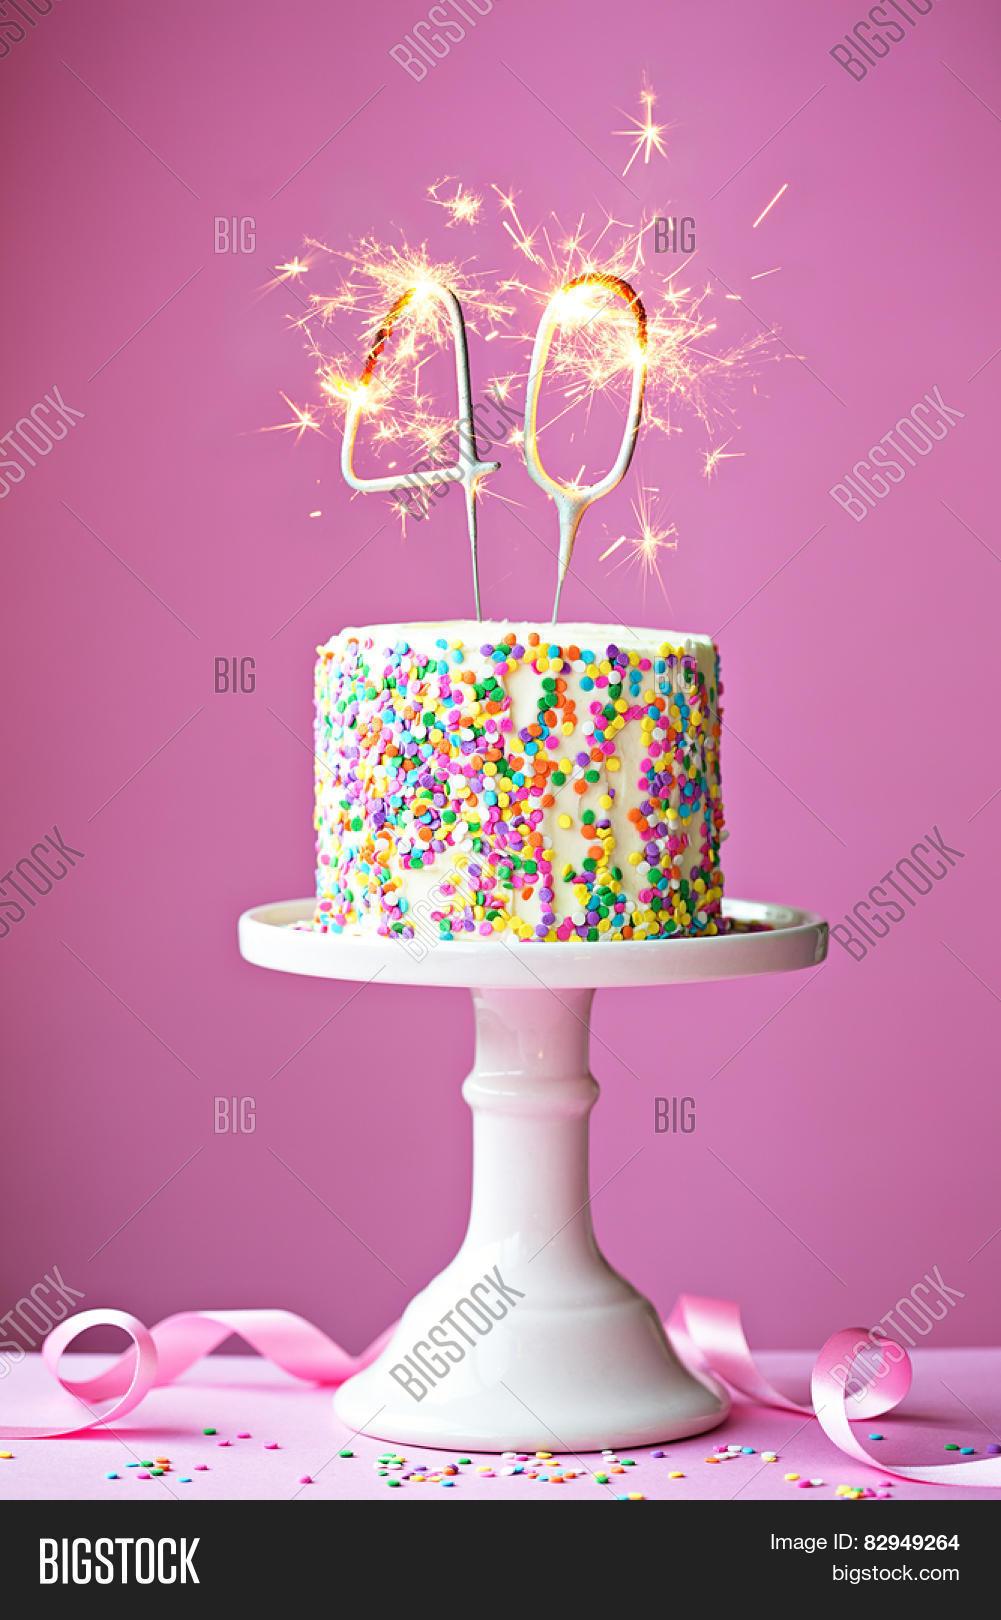 40th Birthday Cake Image Photo Free Trial Bigstock